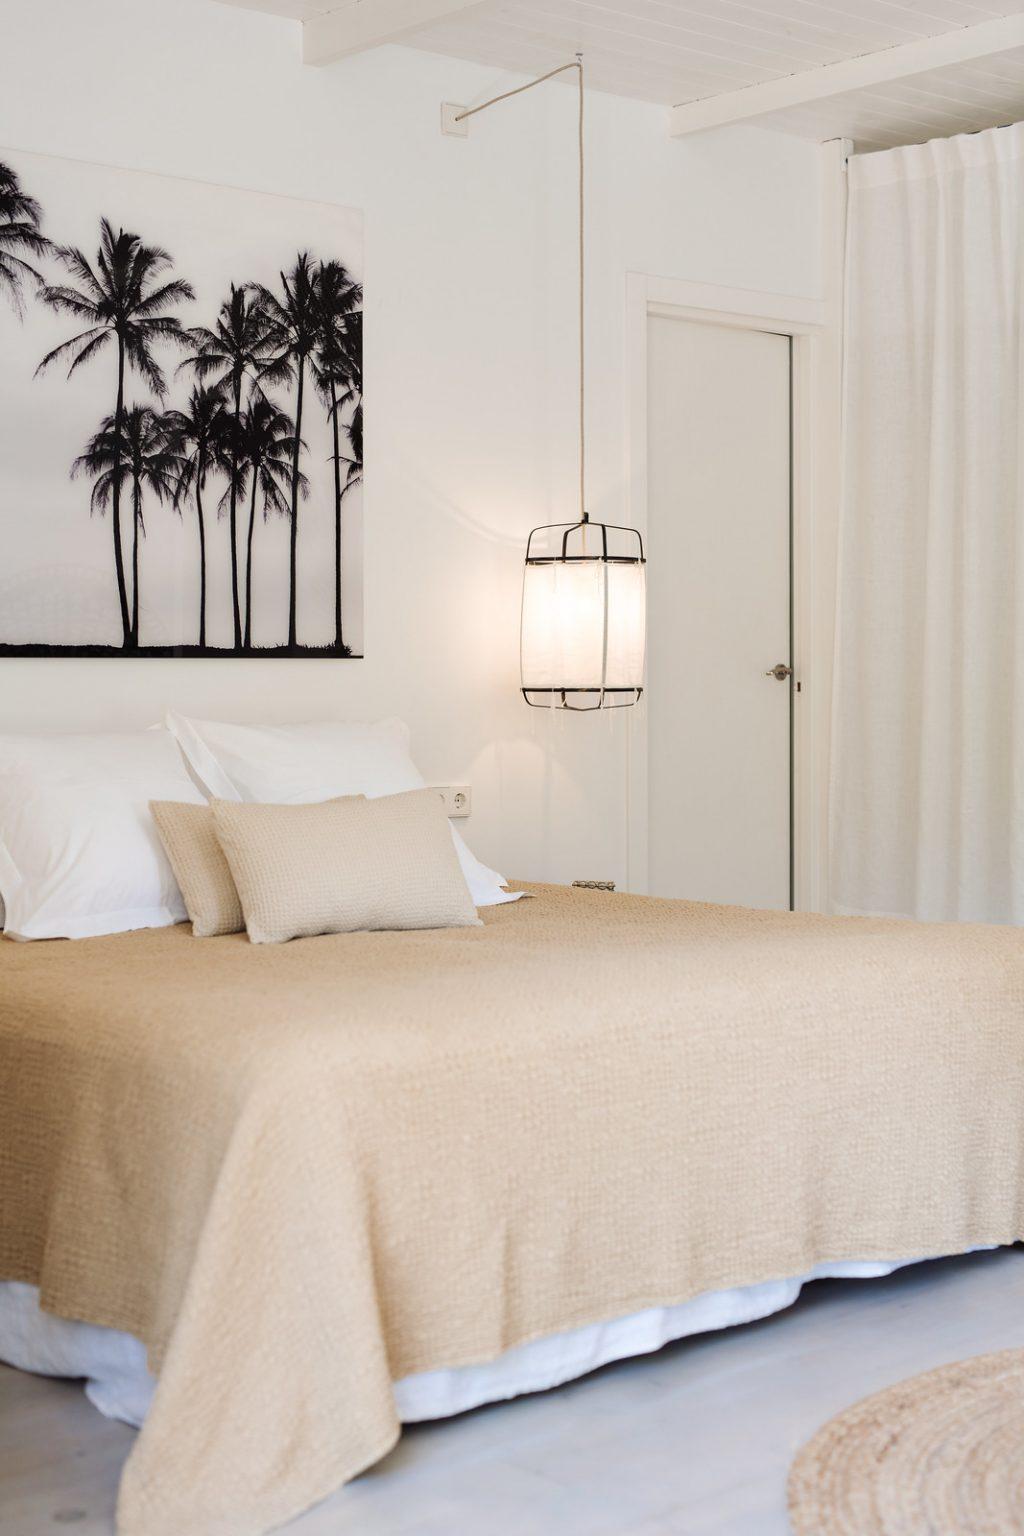 https://www.white-ibiza.com/wp-content/uploads/2020/03/ibiza-hotels-pure-house-ibiza-ana-lui-2021-03-1024x1536.jpg